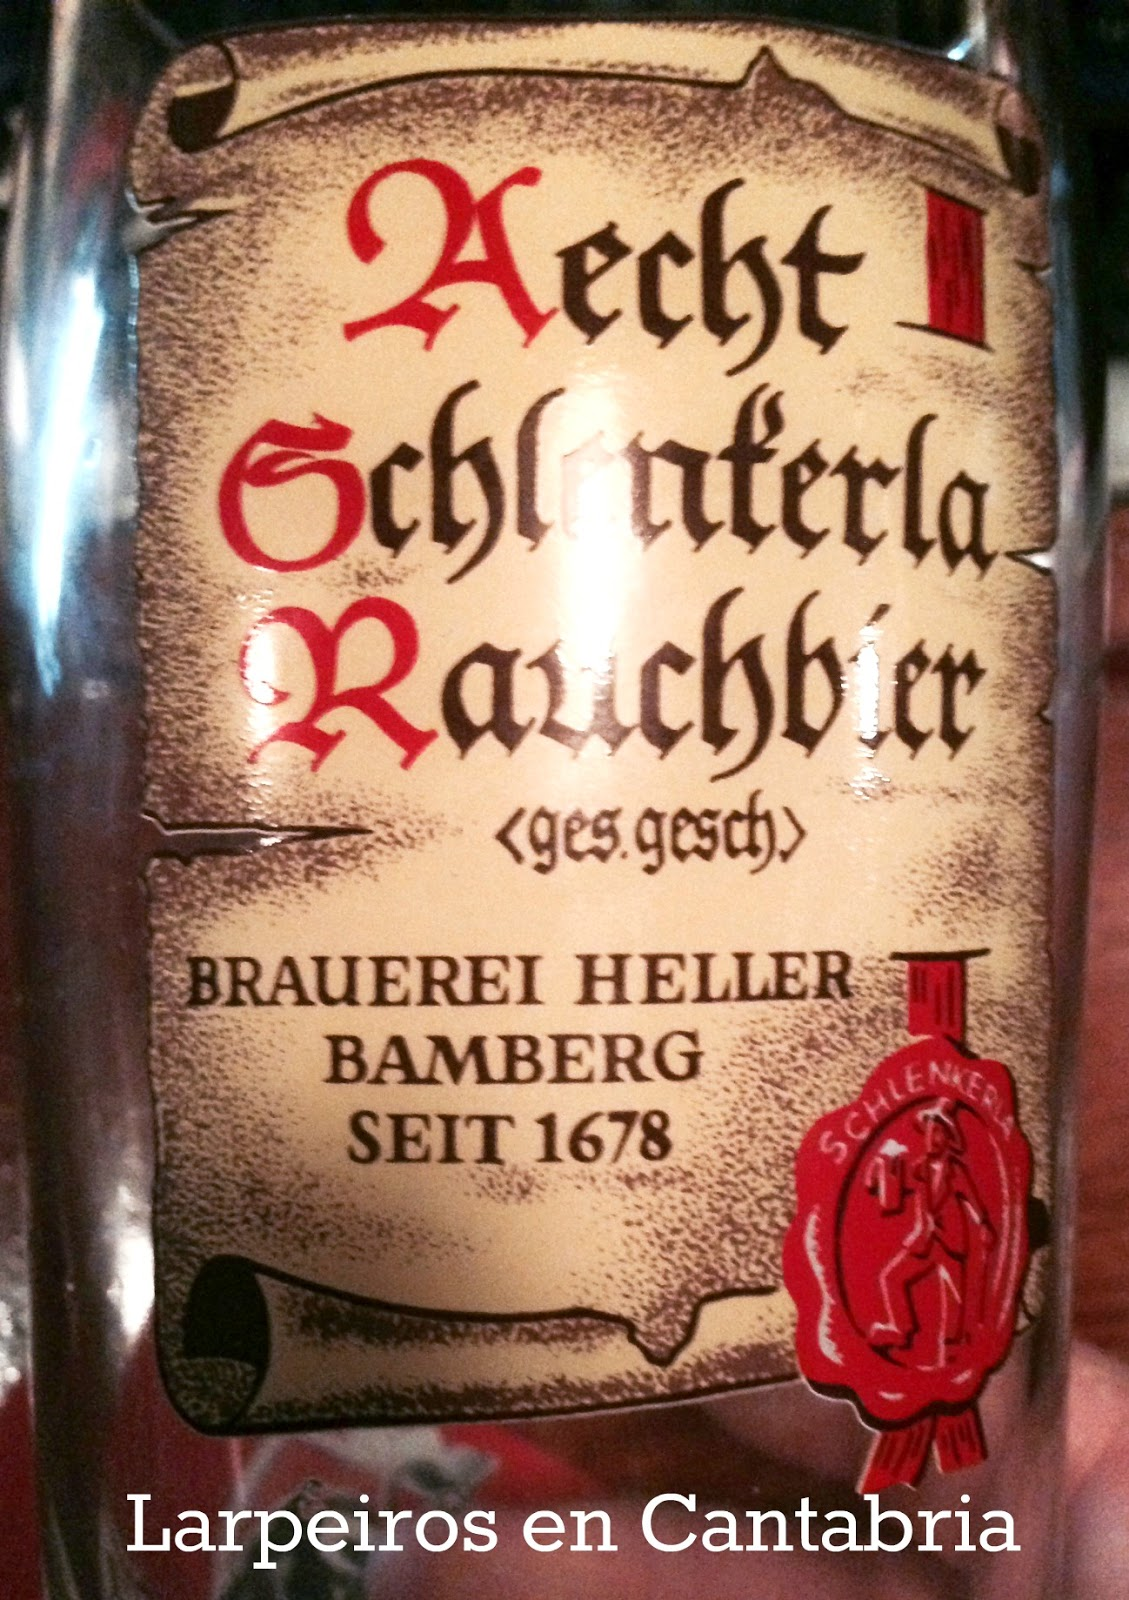 Cerveza Aecht Schlenkerla Rauchbier: Ahumada de Alemania